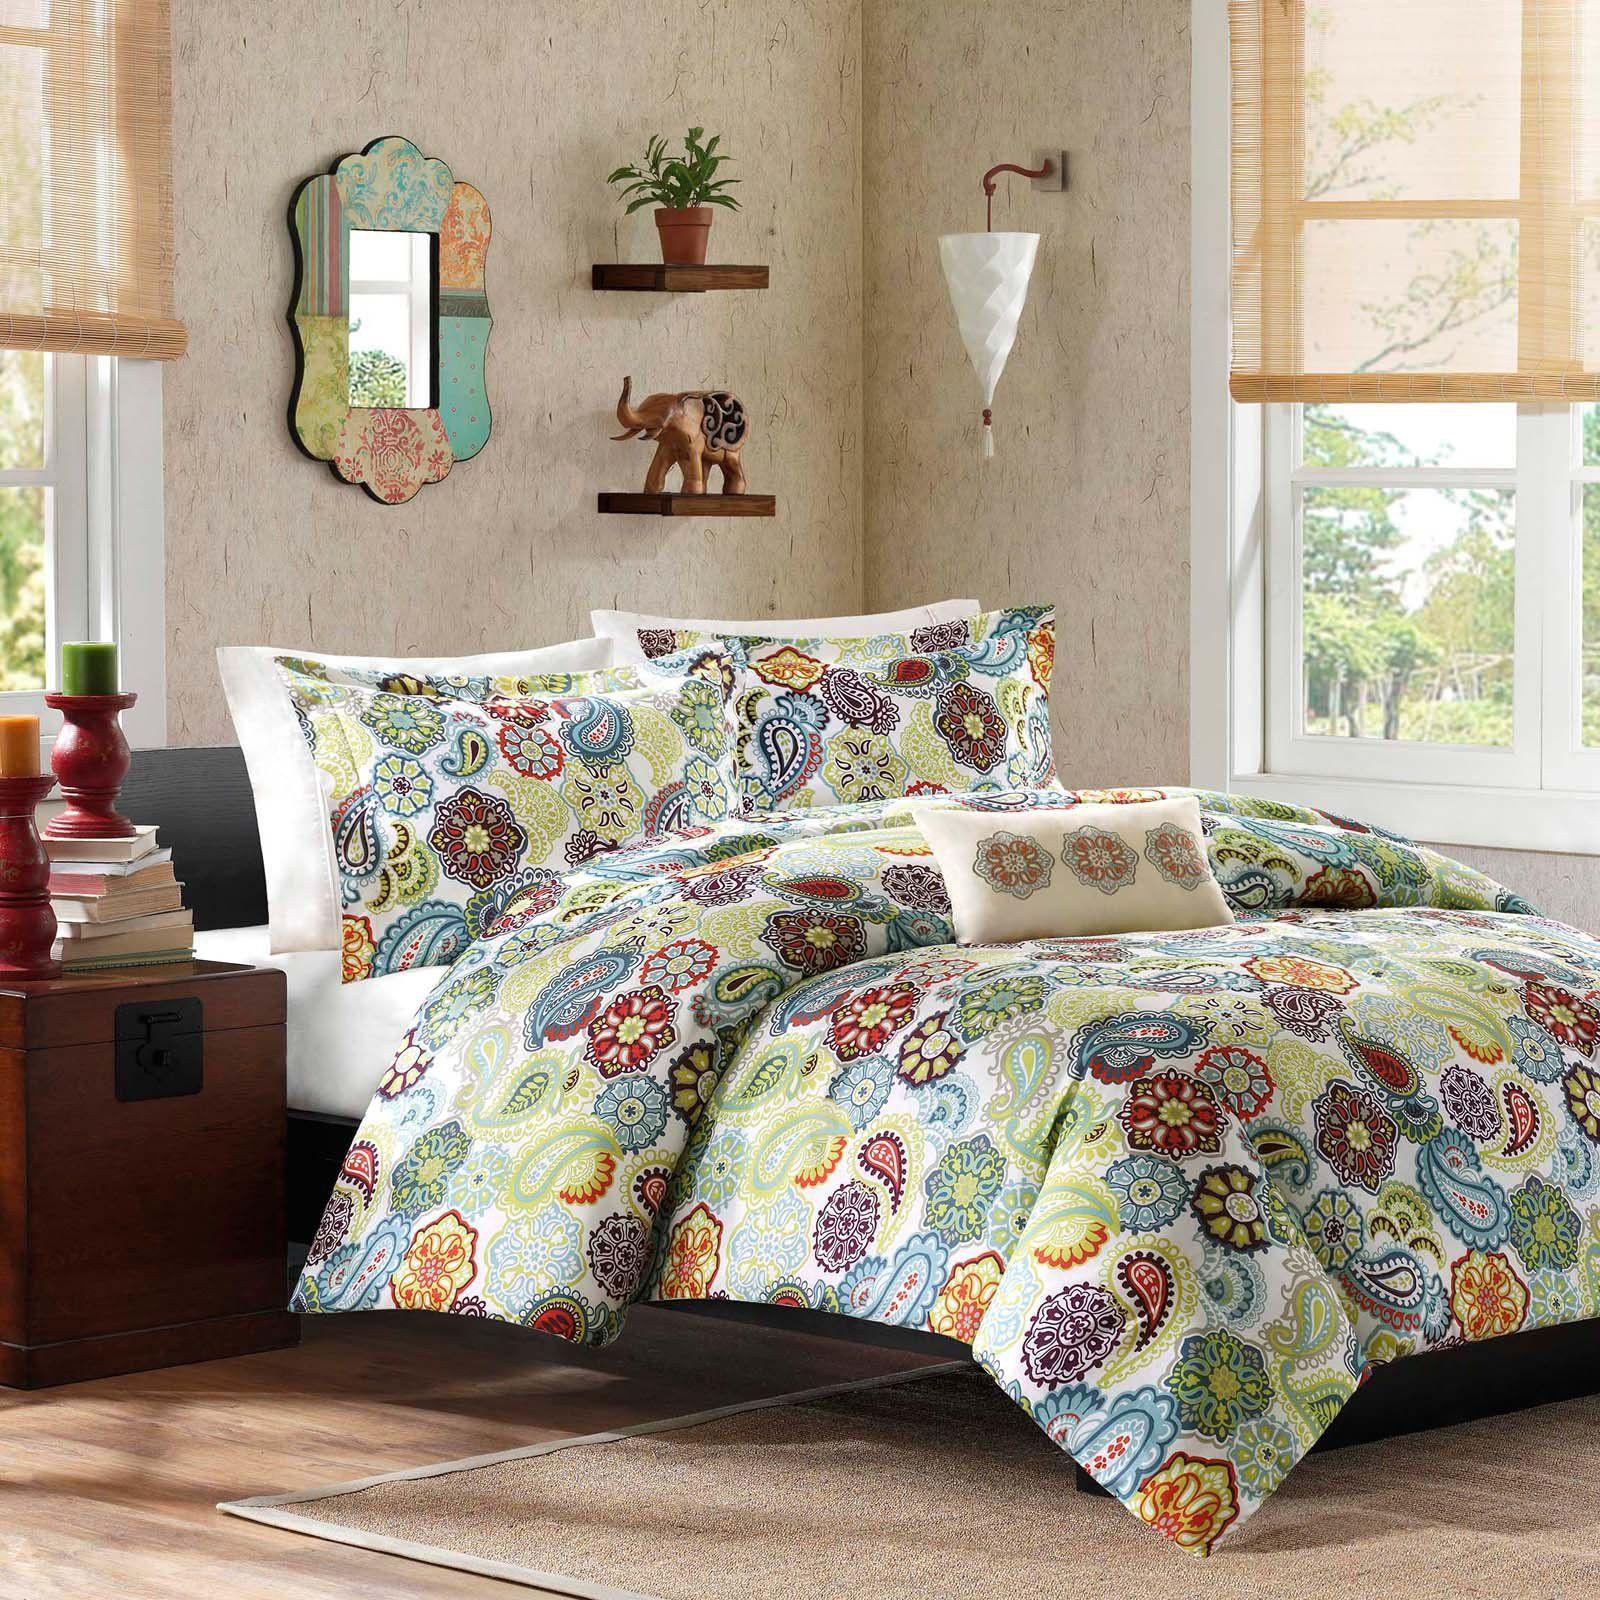 east com comforter ip piece end bedding paisley set blue vintage living walmart